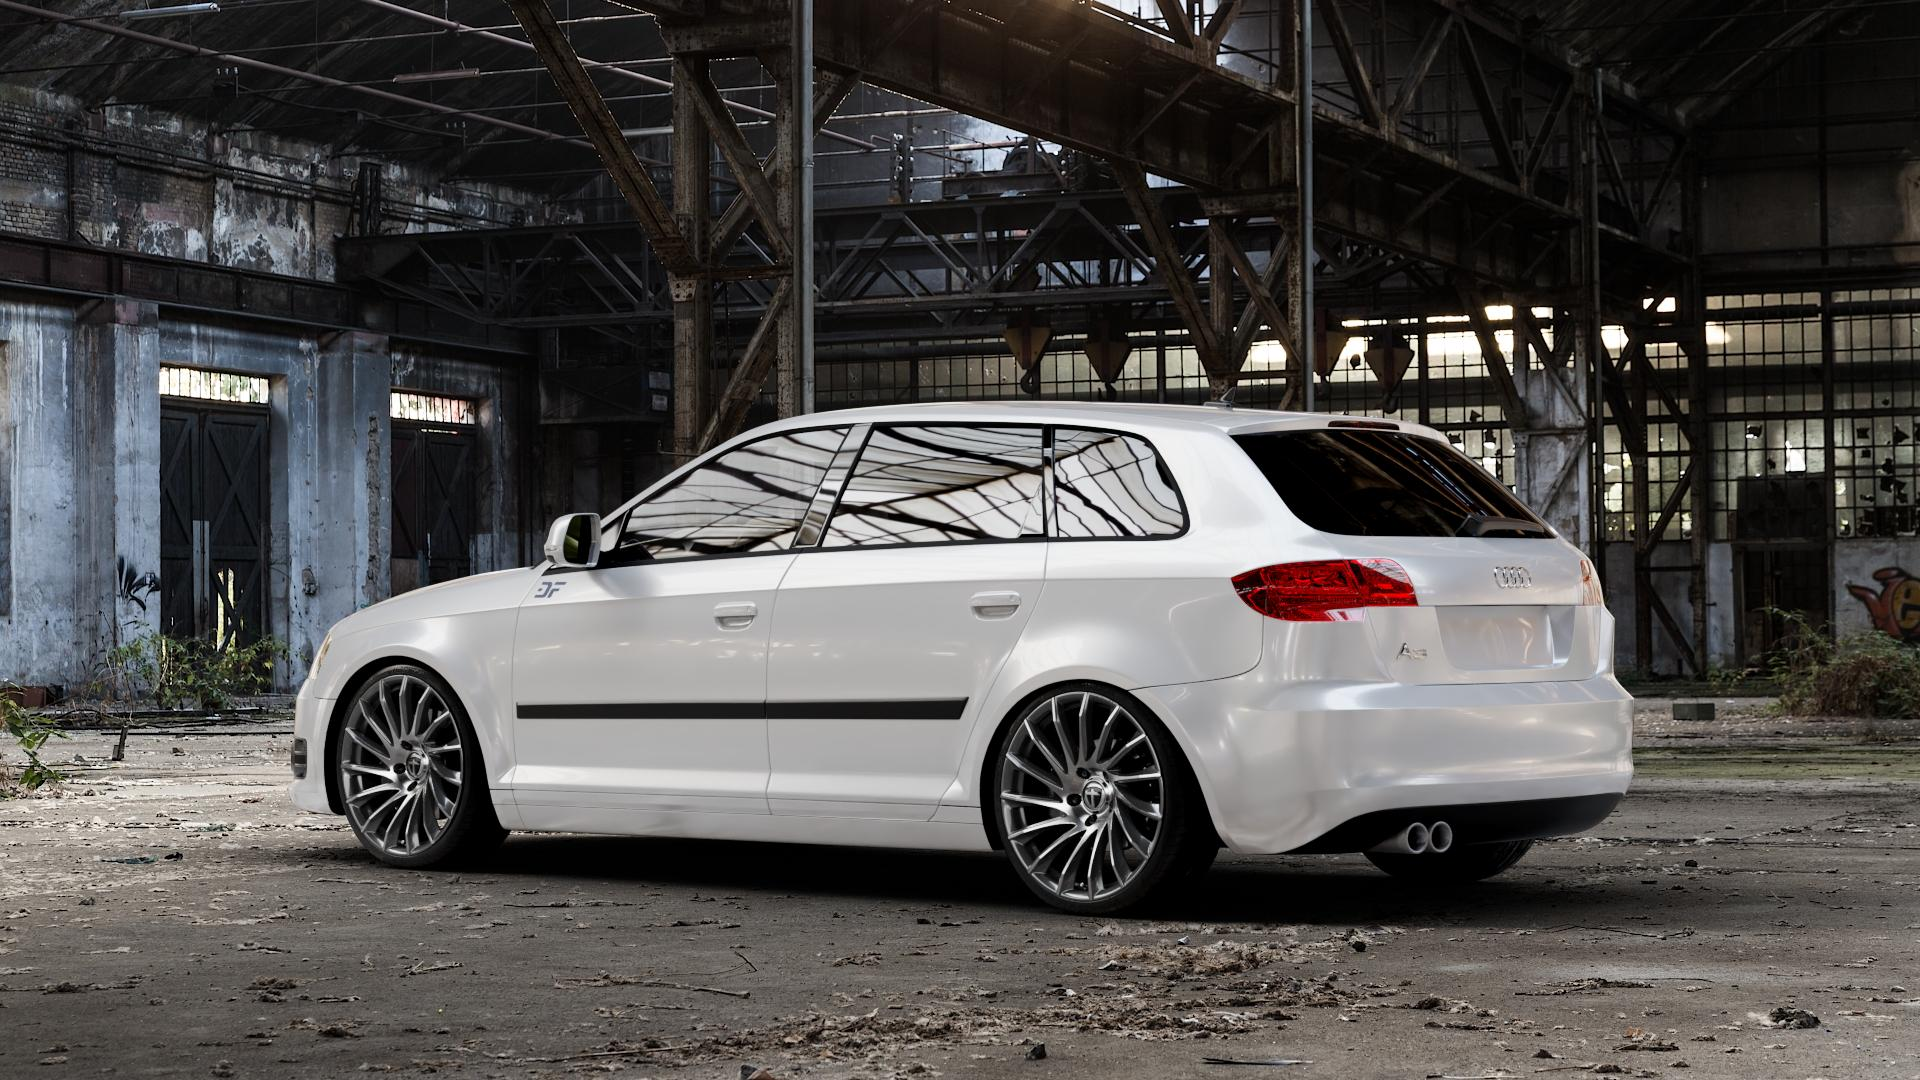 TOMASON TN16 Dark Hyperblack polished Felge mit Reifen silber mehrfarbig in 19Zoll Alufelge auf weissem Audi A3 Typ 8P (Sportback) 1,6l 75kW (102 PS) 2,0l FSI 110kW (150 1,9l TDI 77kW (105 103kW (140 TFSI 147kW (200 85kW (116 100kW (136 1,8l 118kW (160 125kW (170 1,4l 92kW (125 120kW (163 quattro 3,2l V6 184kW (250 S3 195kW (265 1,2l 66kW (90 18